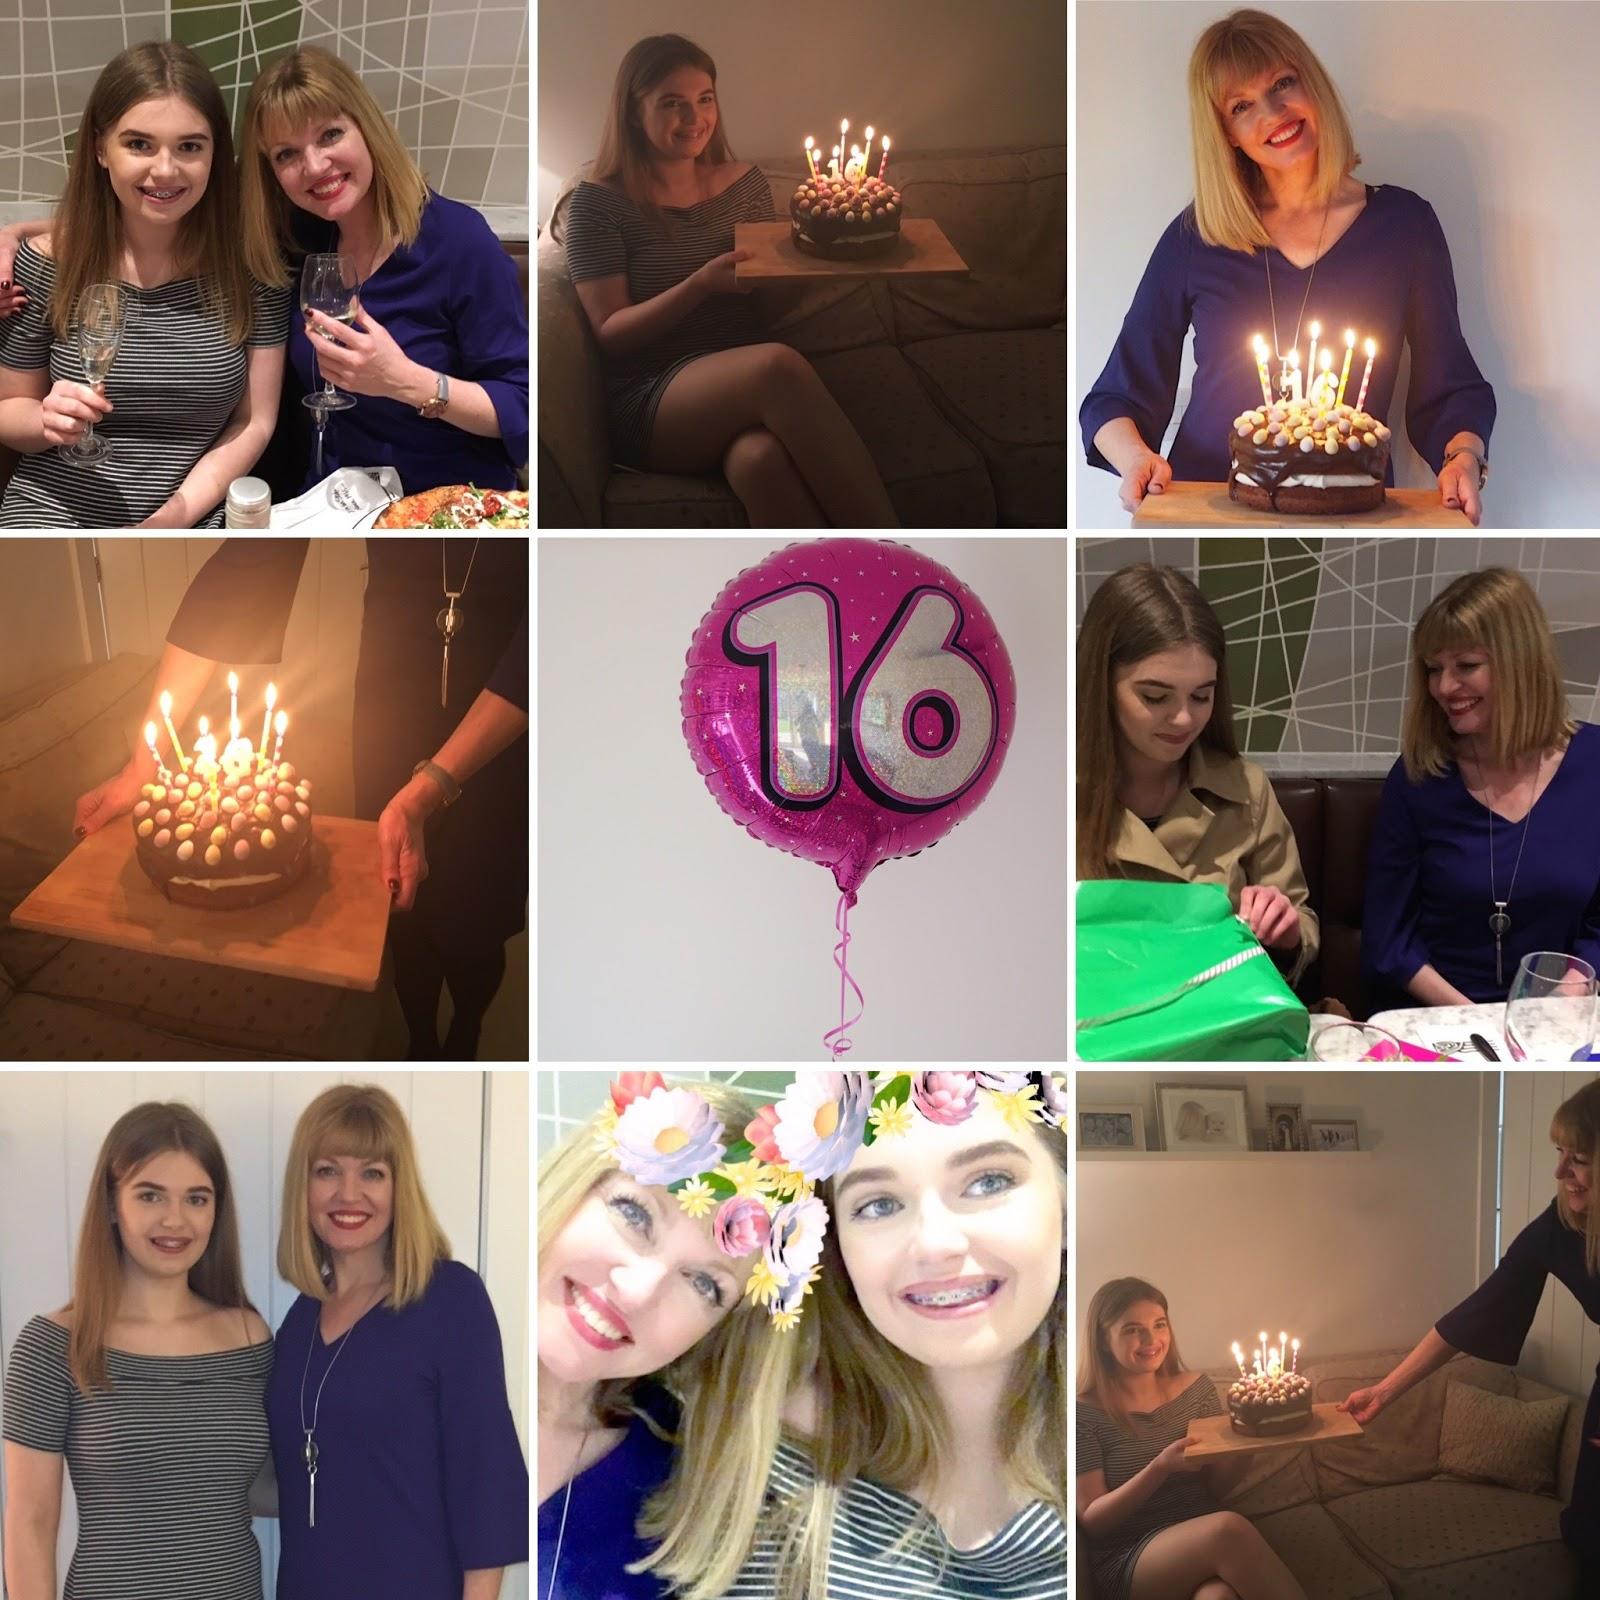 Finery London iris v neck jersey dress over 40, 16th birthday party